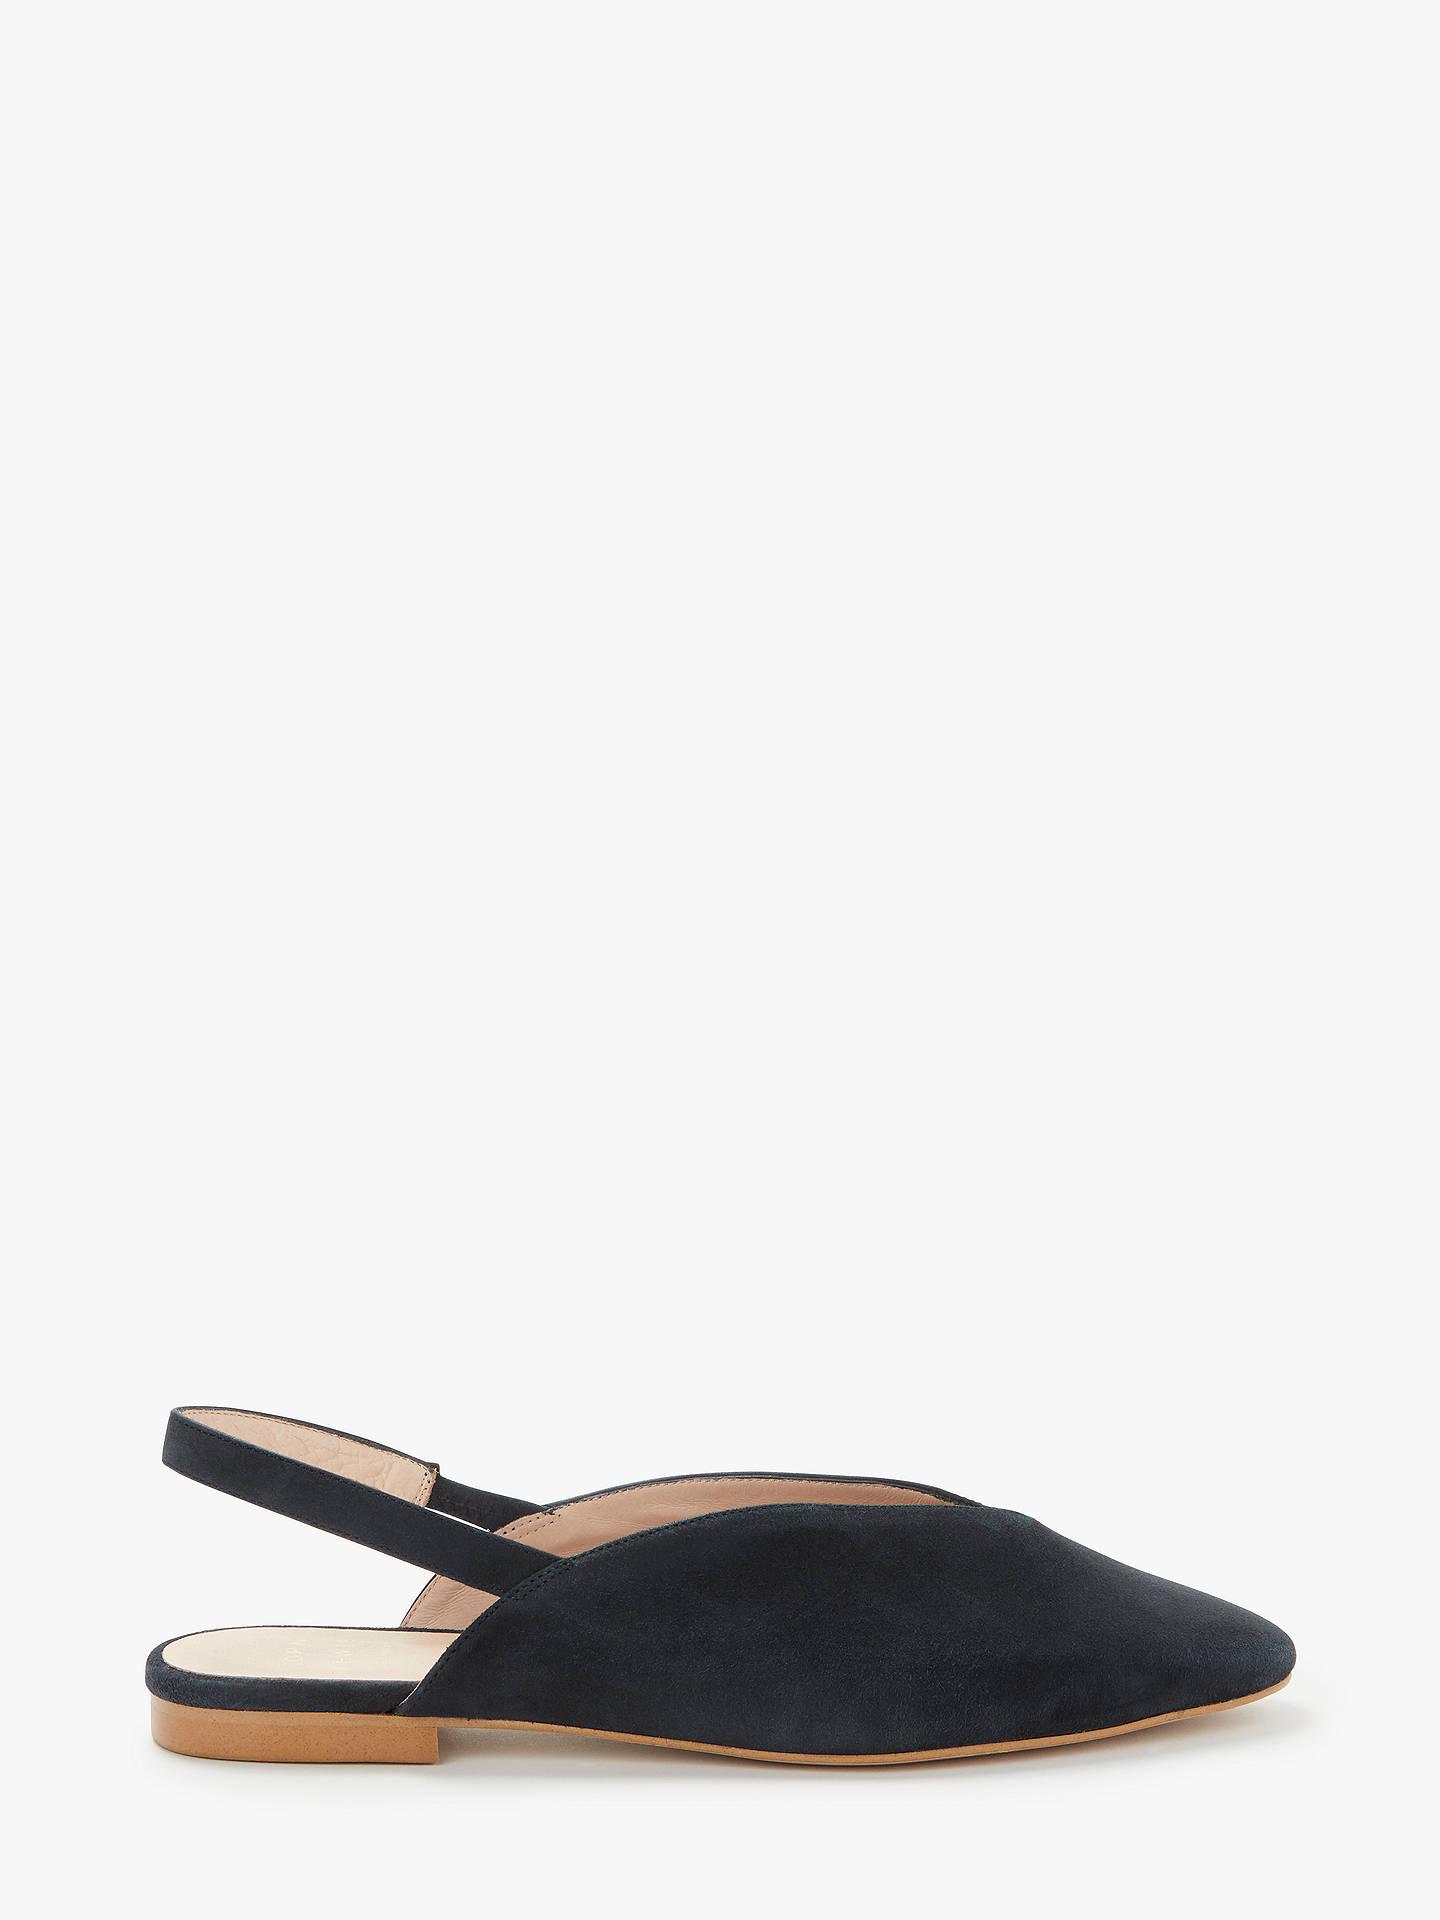 4d516595fe Buy John Lewis & Partners Clara V Cut Flat Slingback Flat Court Shoes, Navy  Suede ...